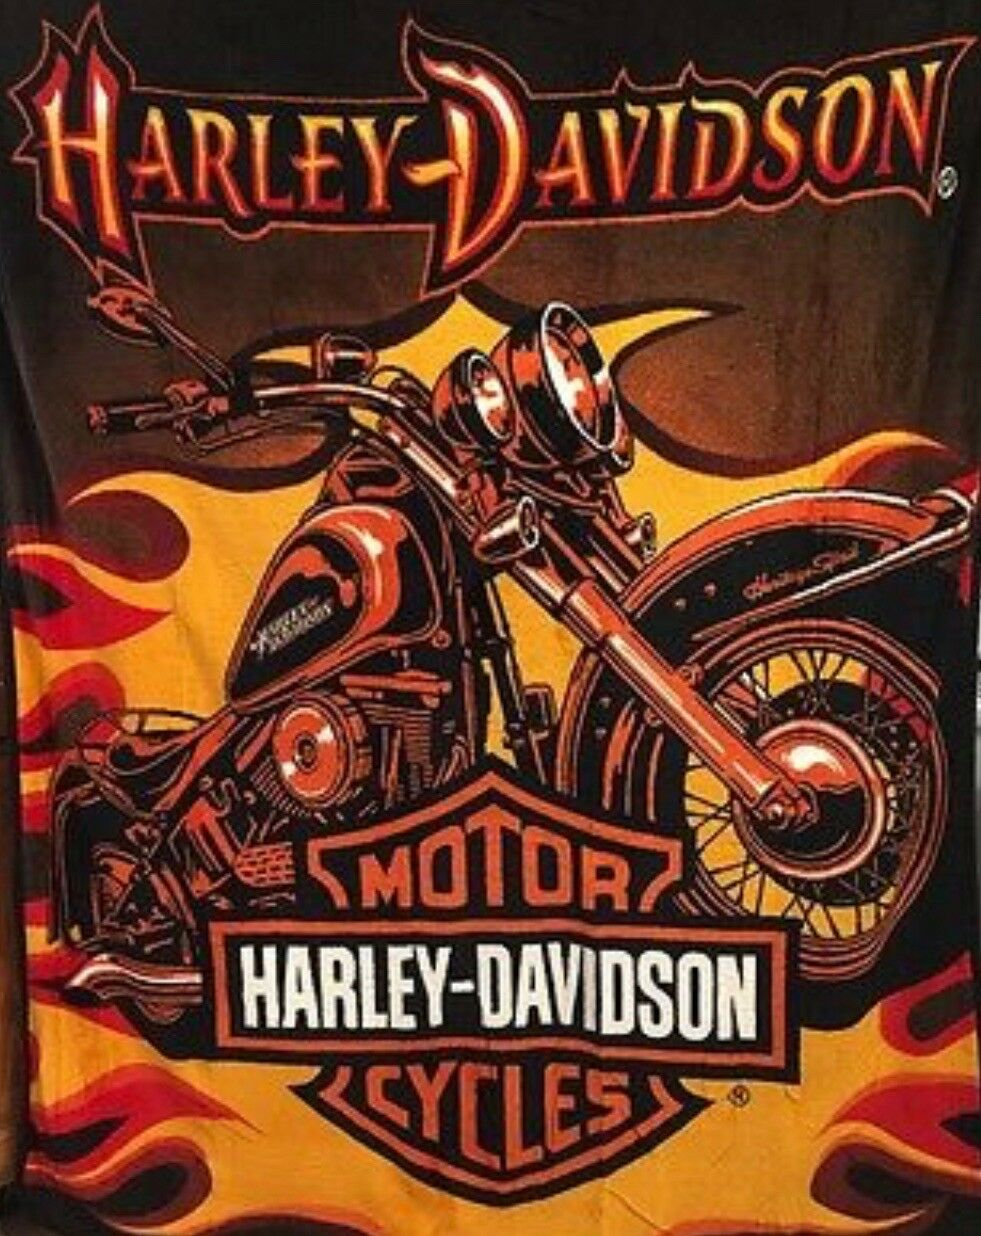 Harley Davidson Sunset Plush Raschel Couverture Lancer Reine Taille 76 par 94 in (environ 238.76 cm)